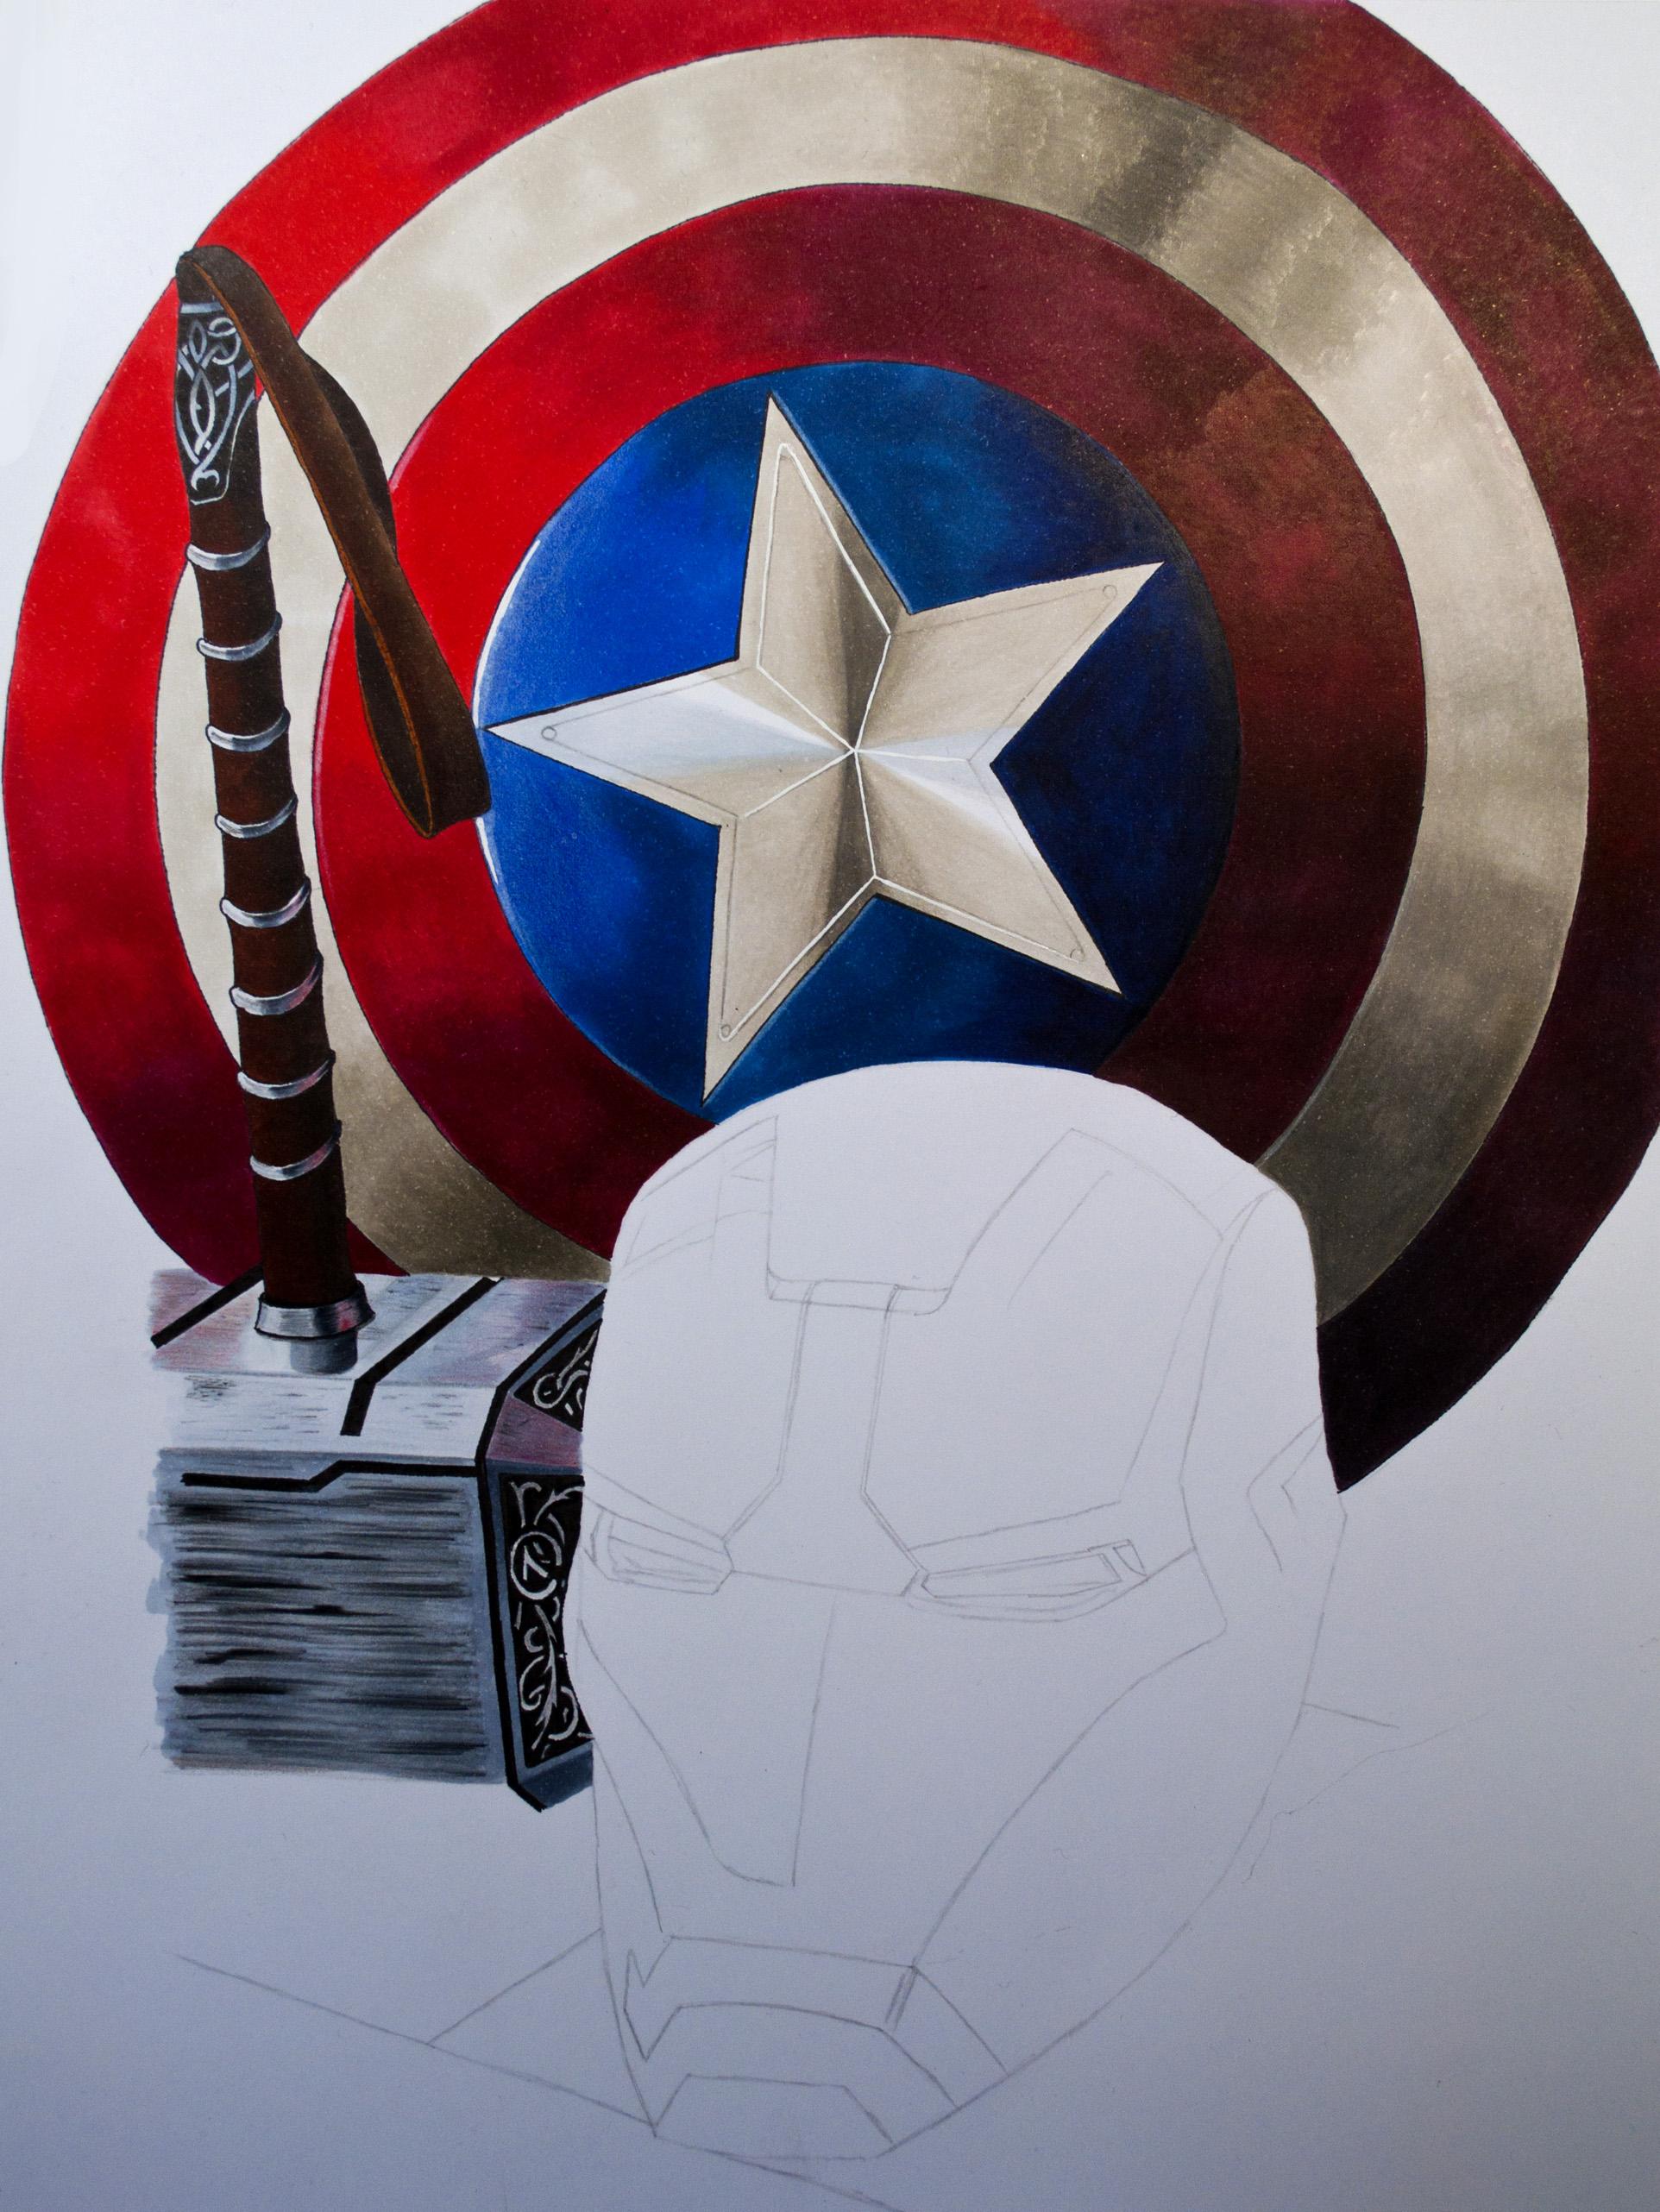 Marvel Image 1a.jpg